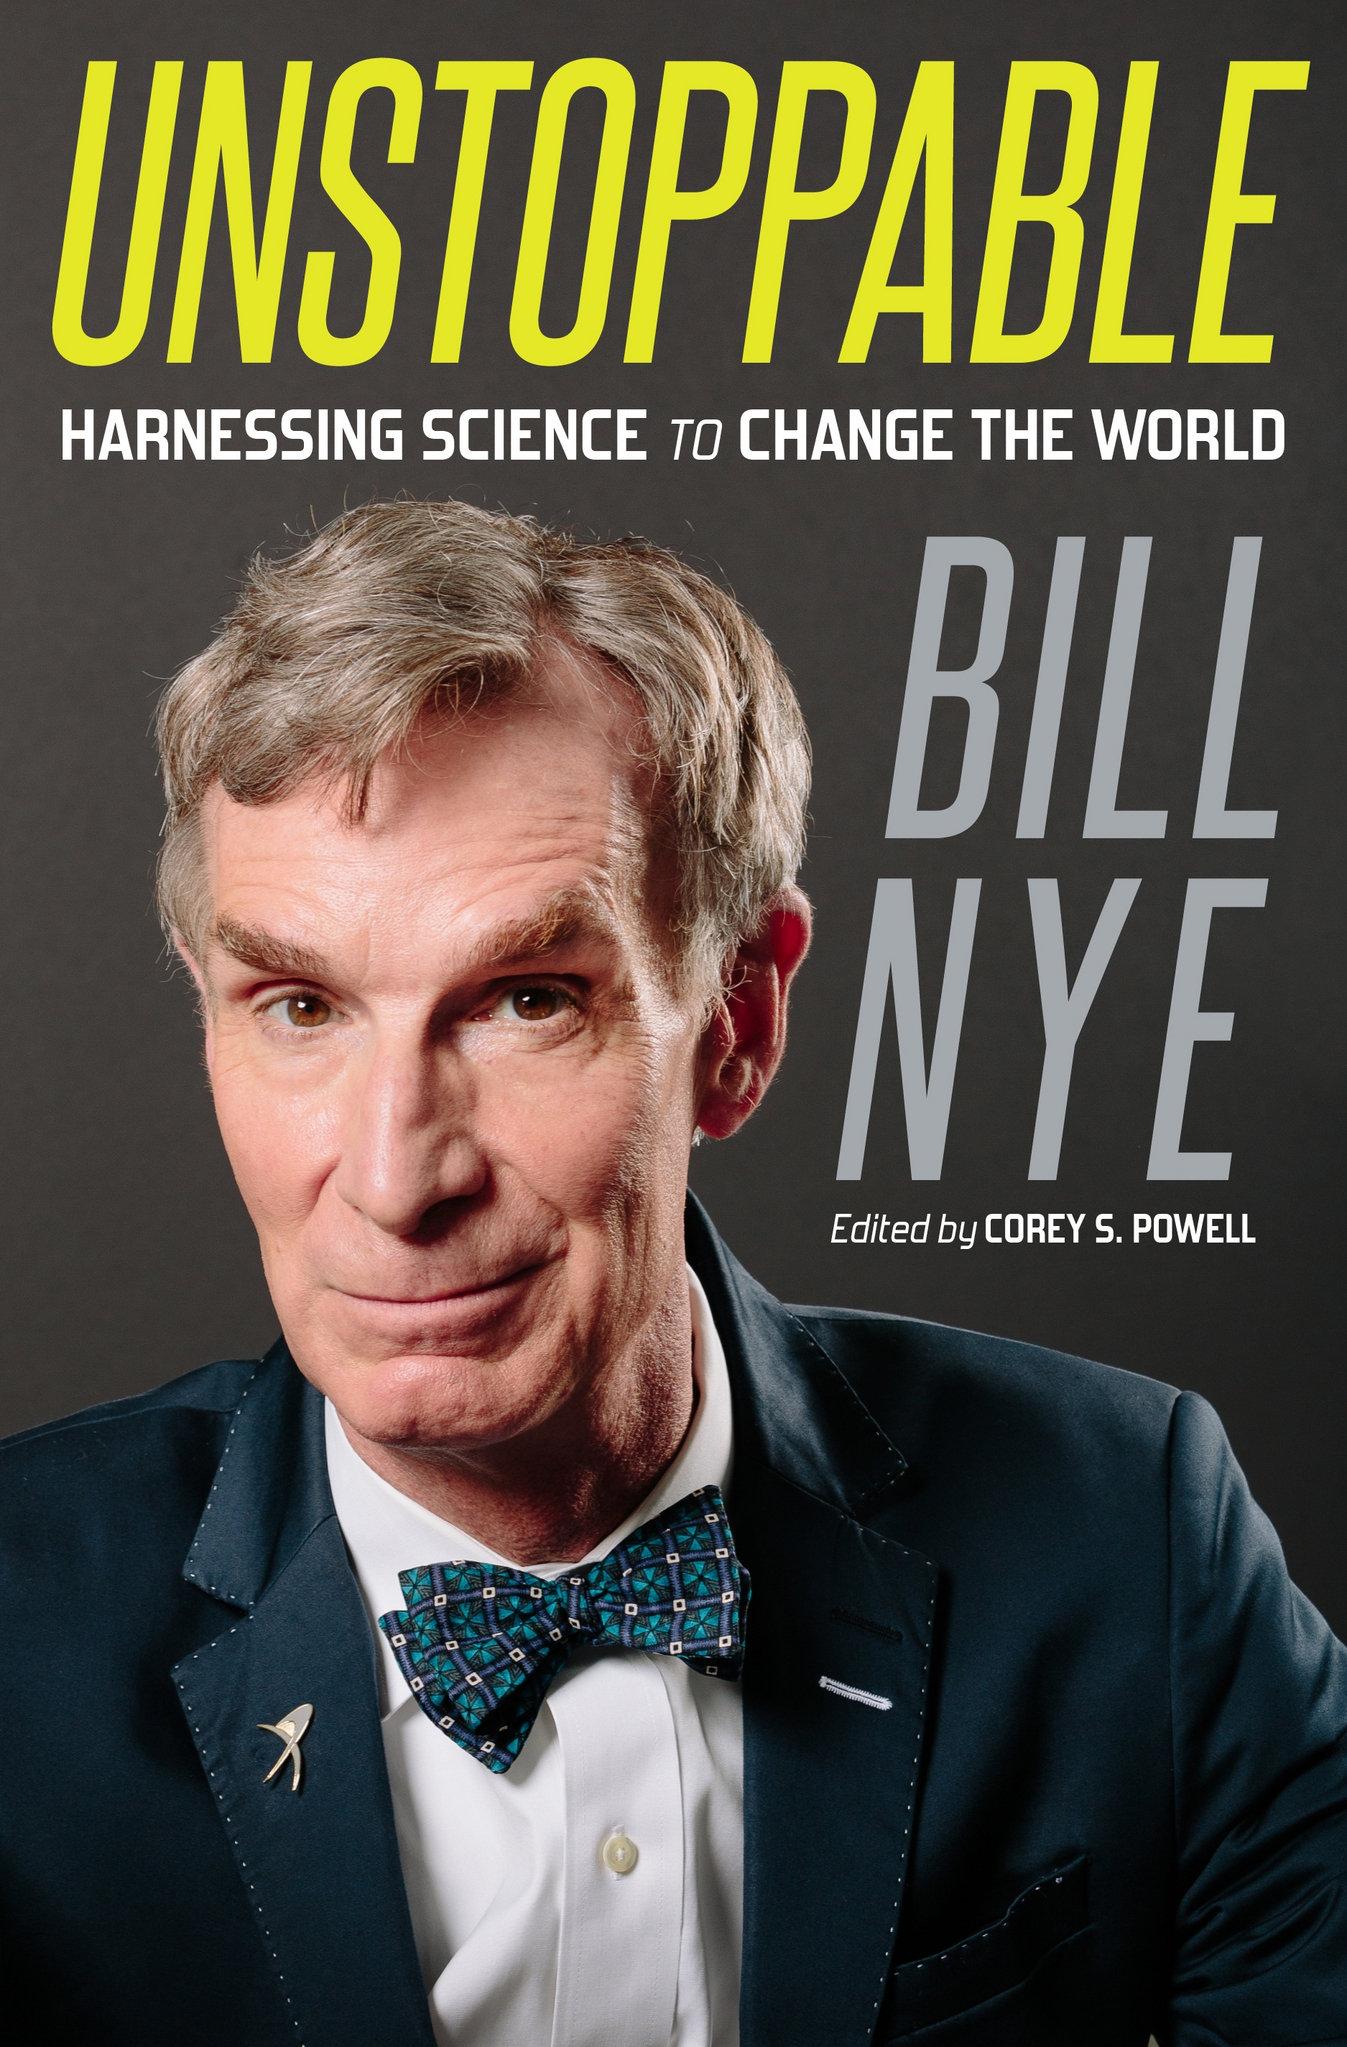 Bill nye podcast